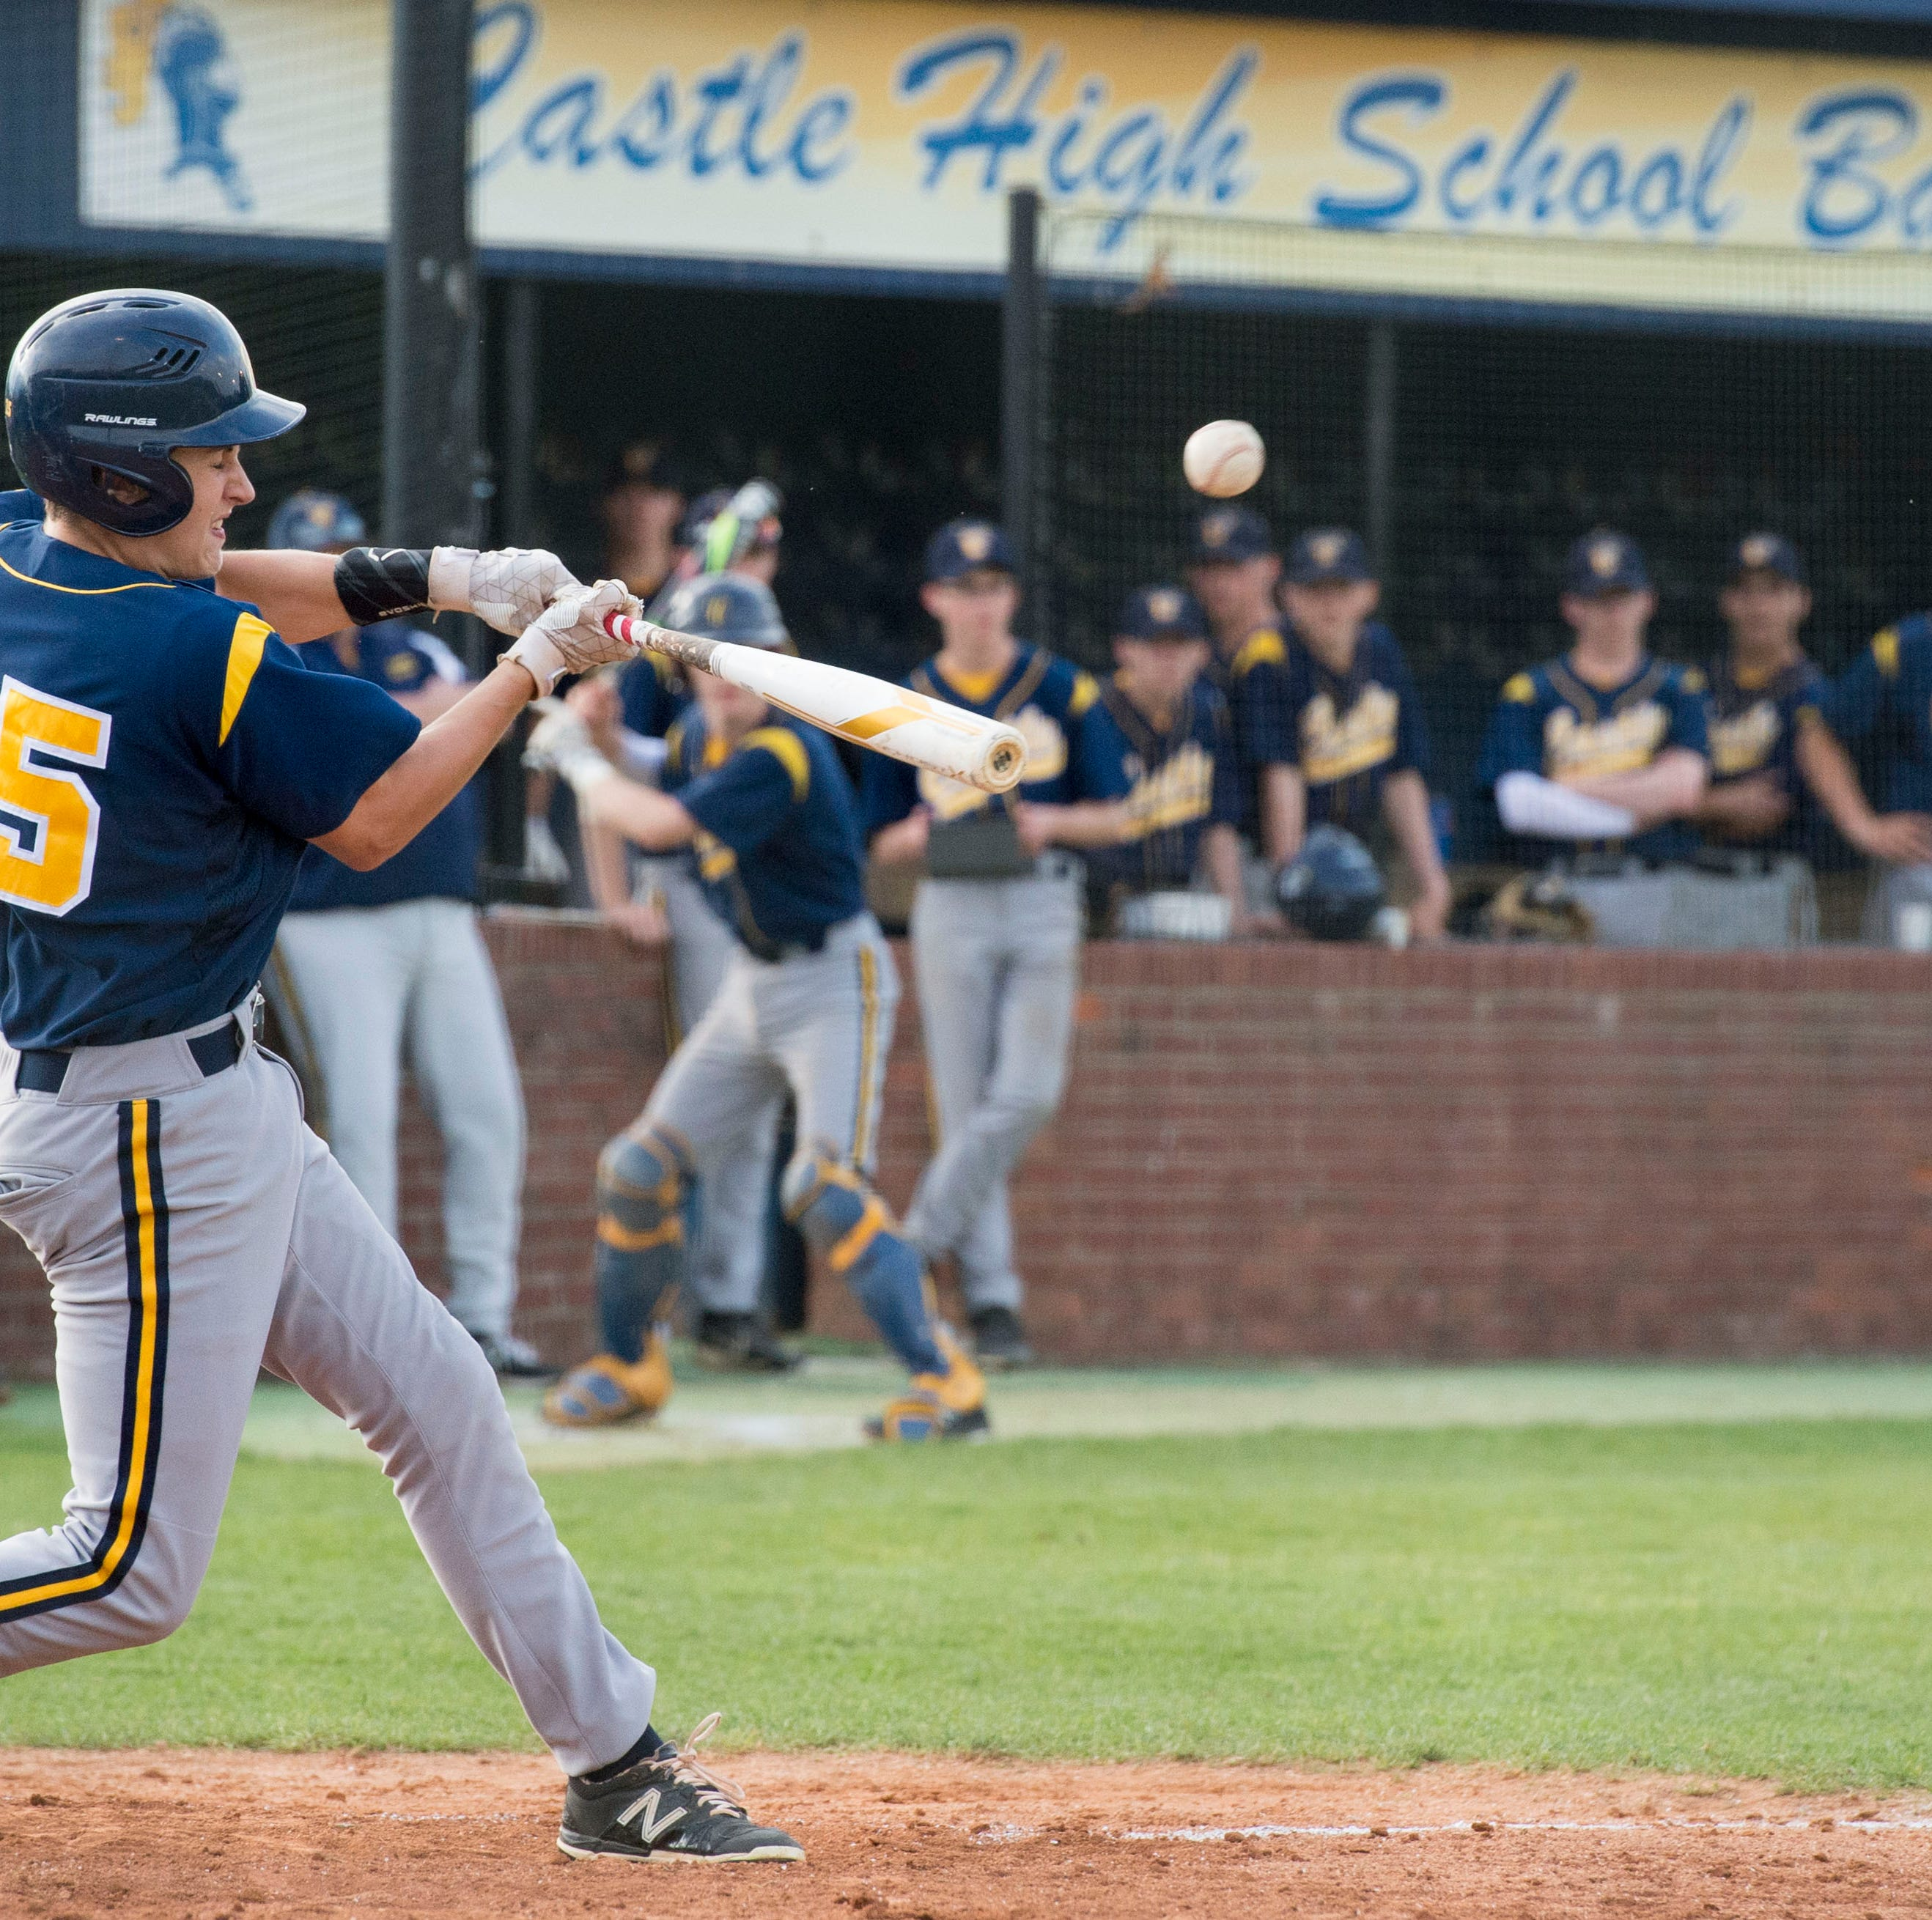 Top 5 early matchups in IHSAA high school baseball sectional